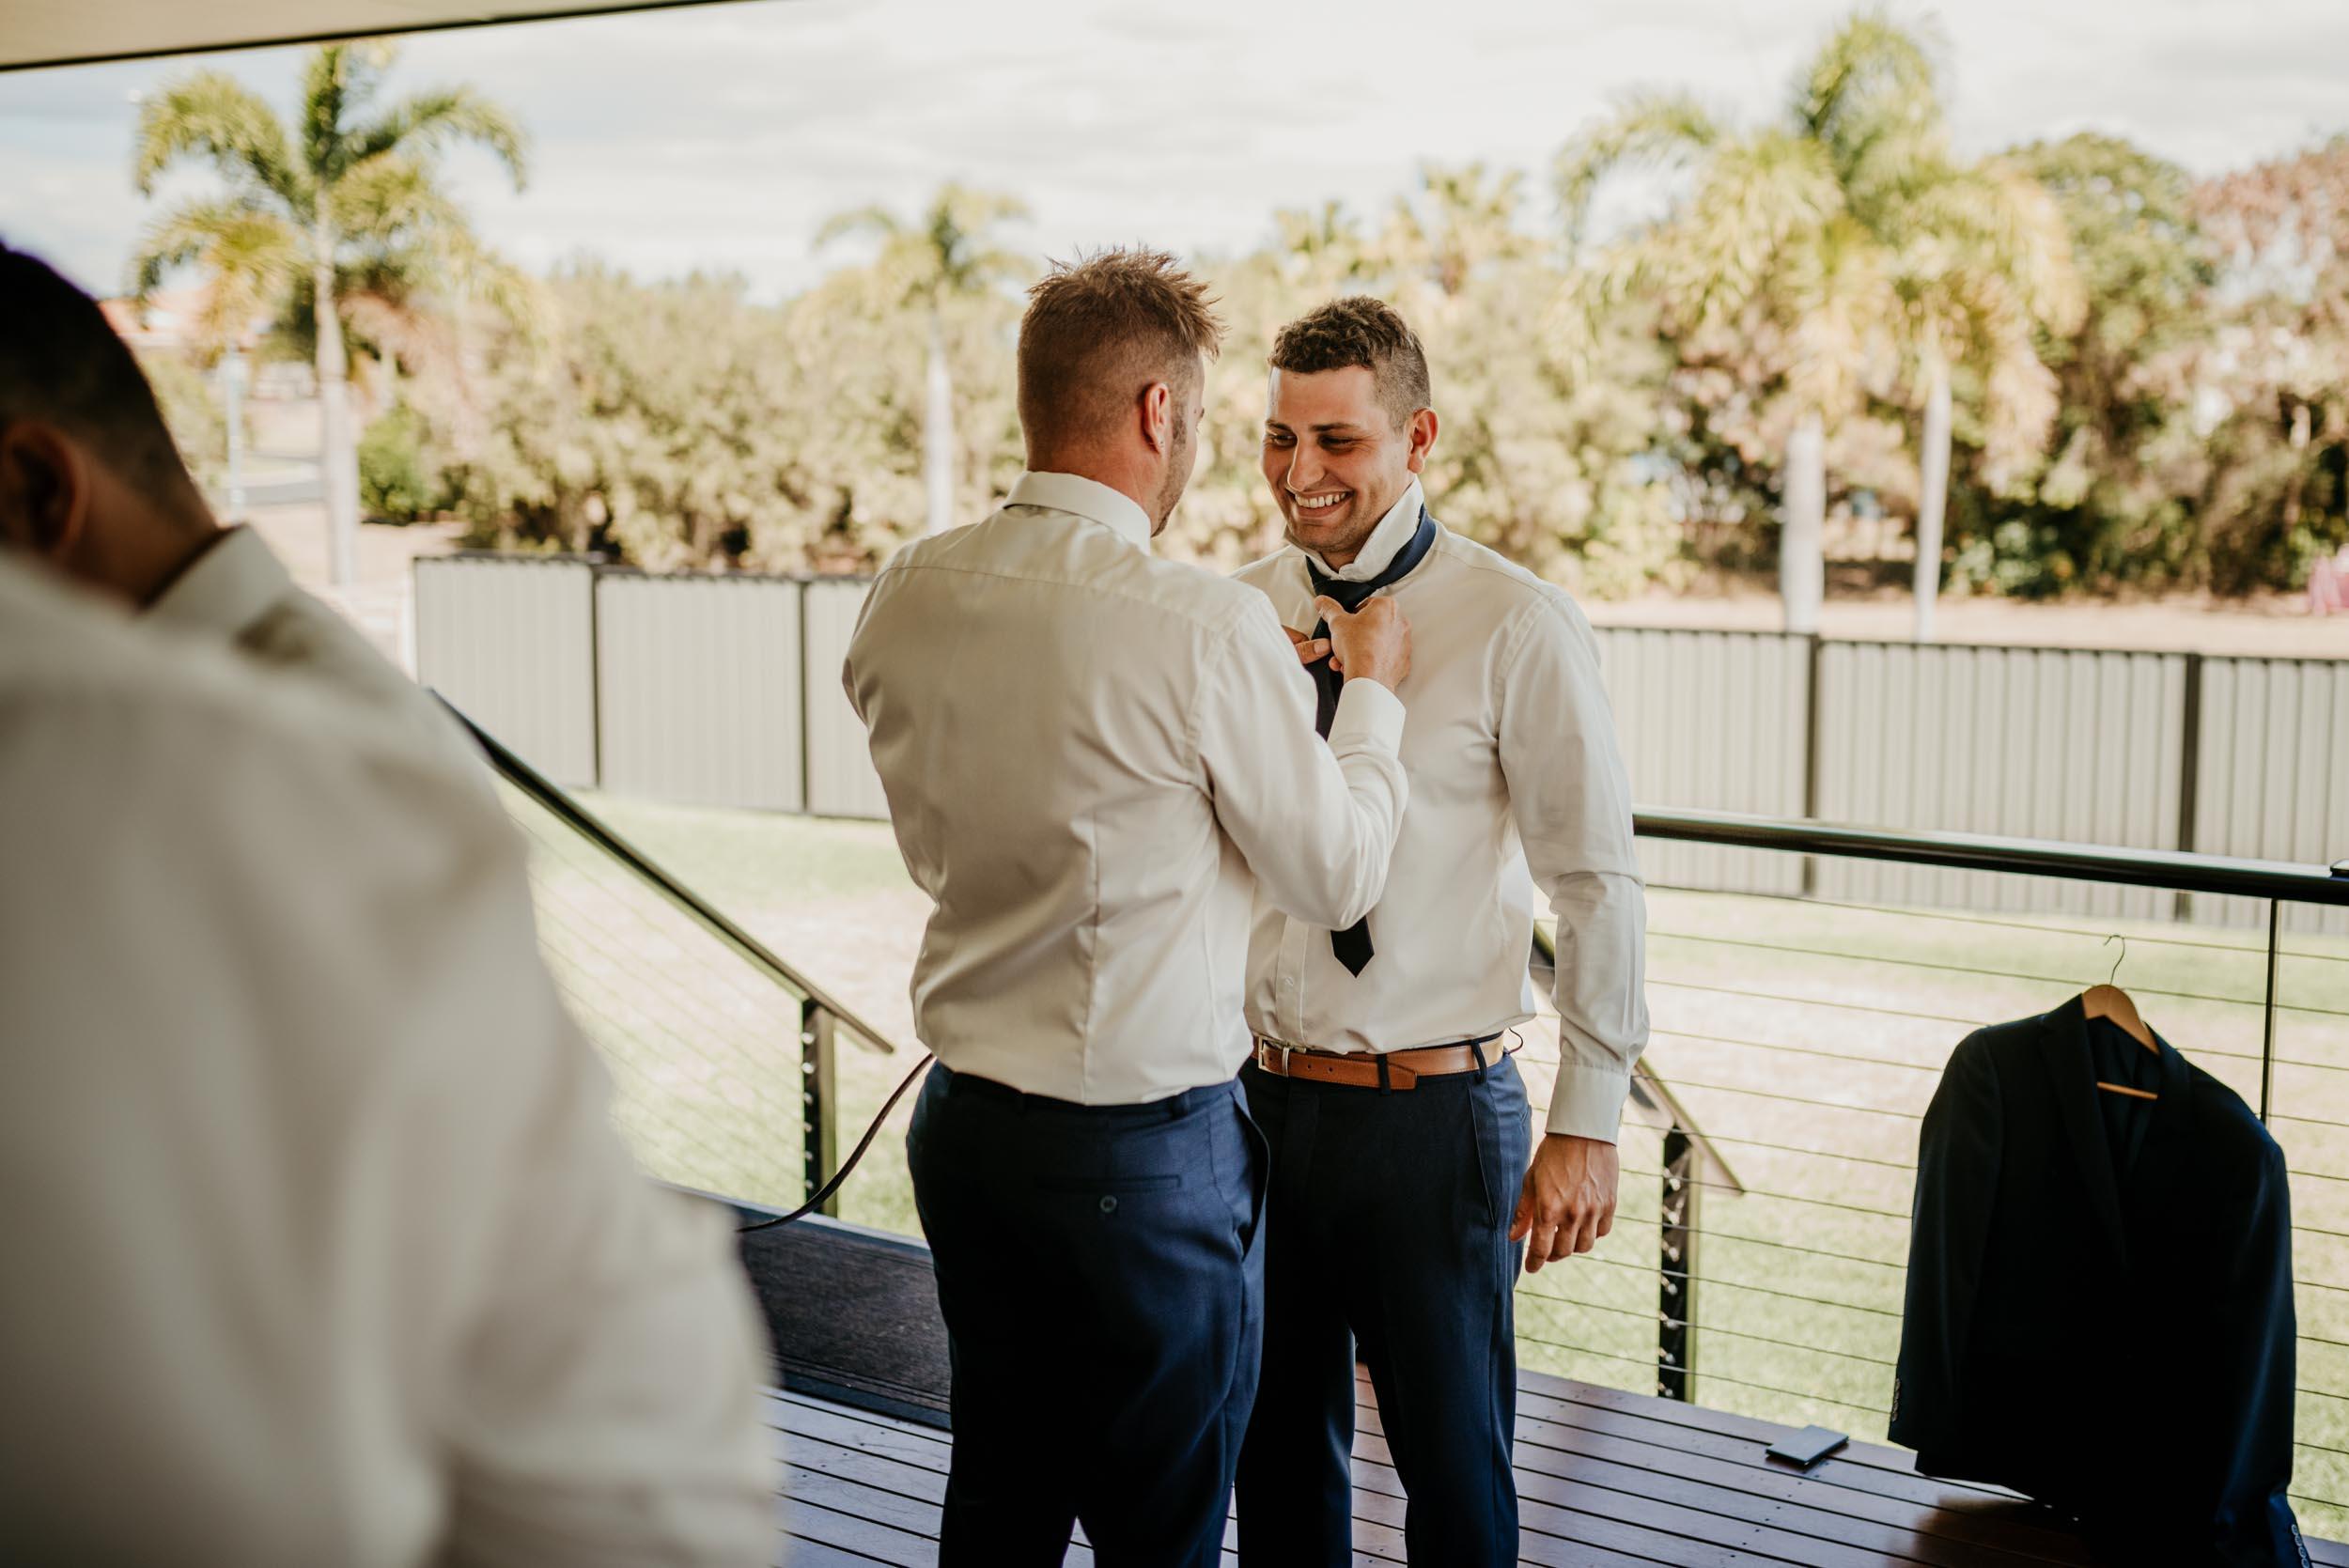 The Raw Photographer - Cairns Wedding Photographer - Atherton Tablelands - Mareeba farm Wedding - Irene Costa's Devine Bridal - Candid - Photo Package-3.jpg